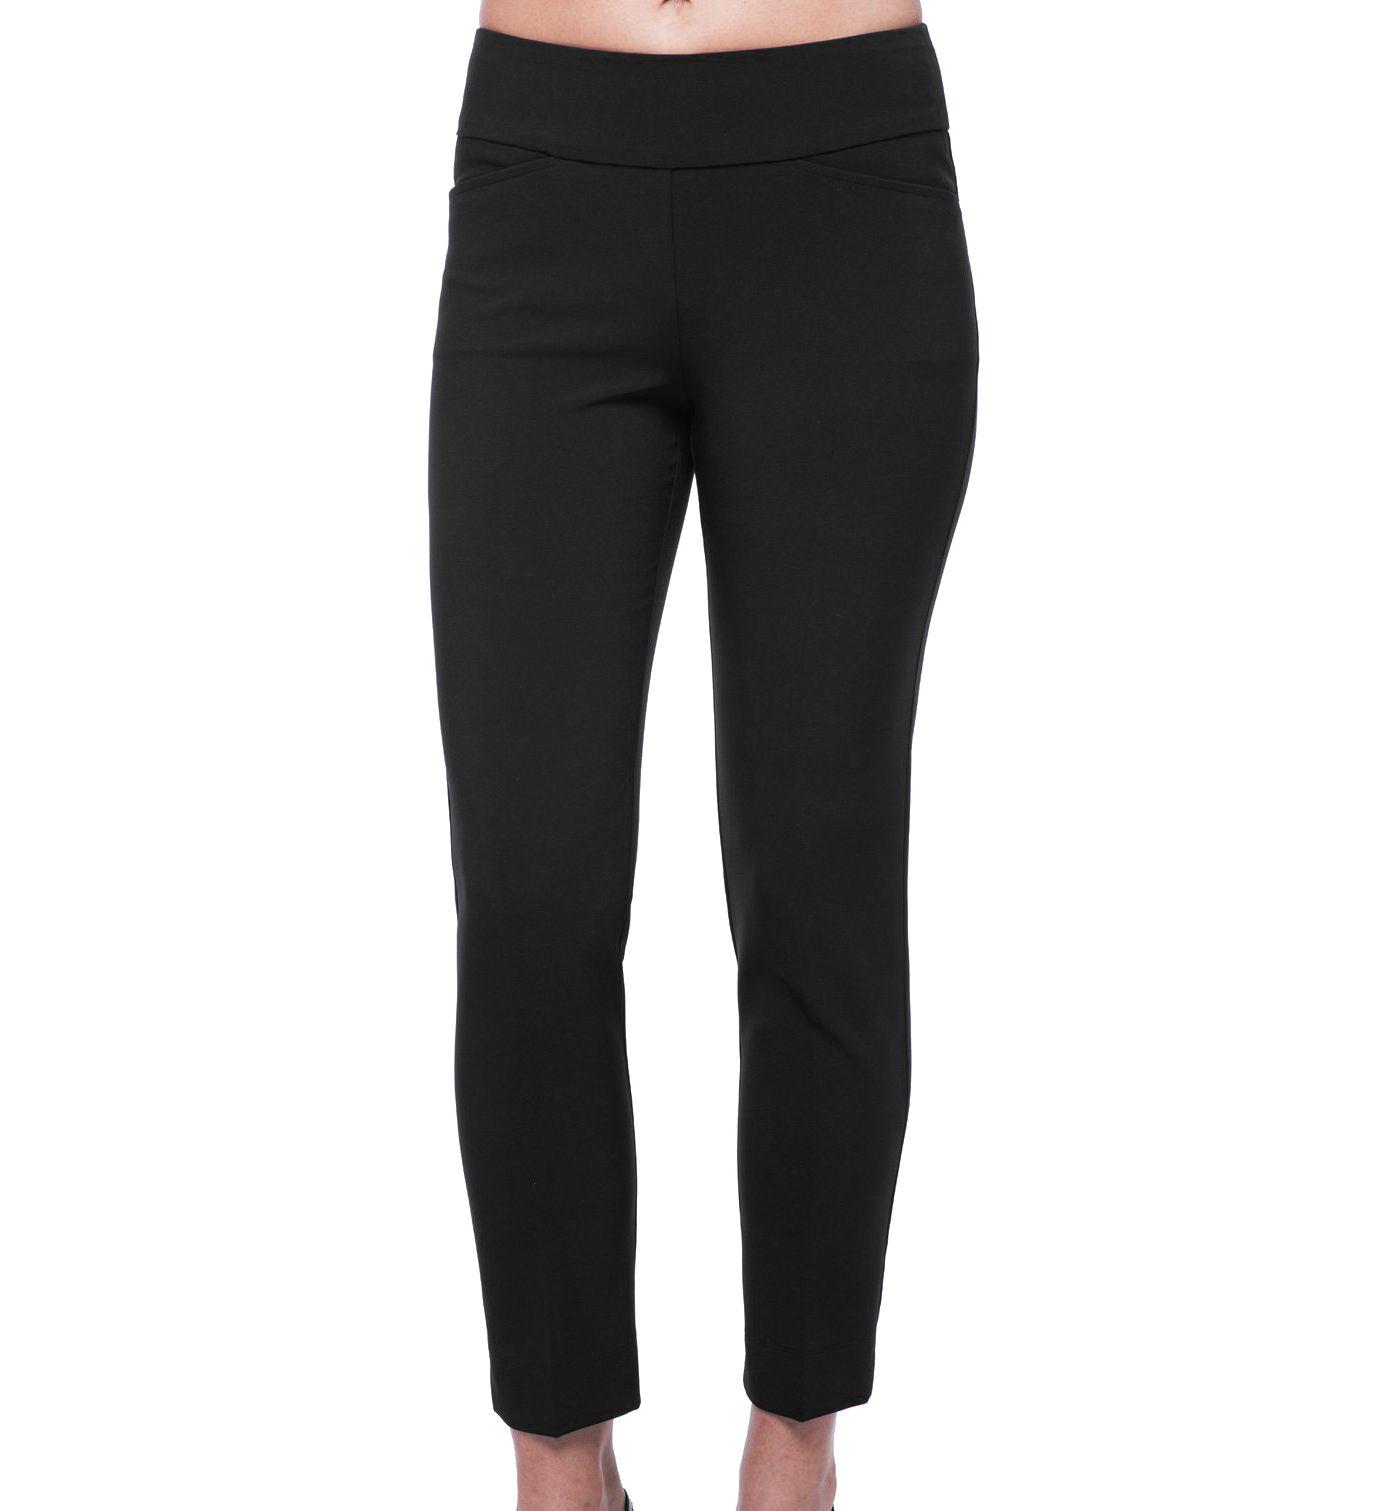 IBKUL Women's Ankle Length Golf Pants